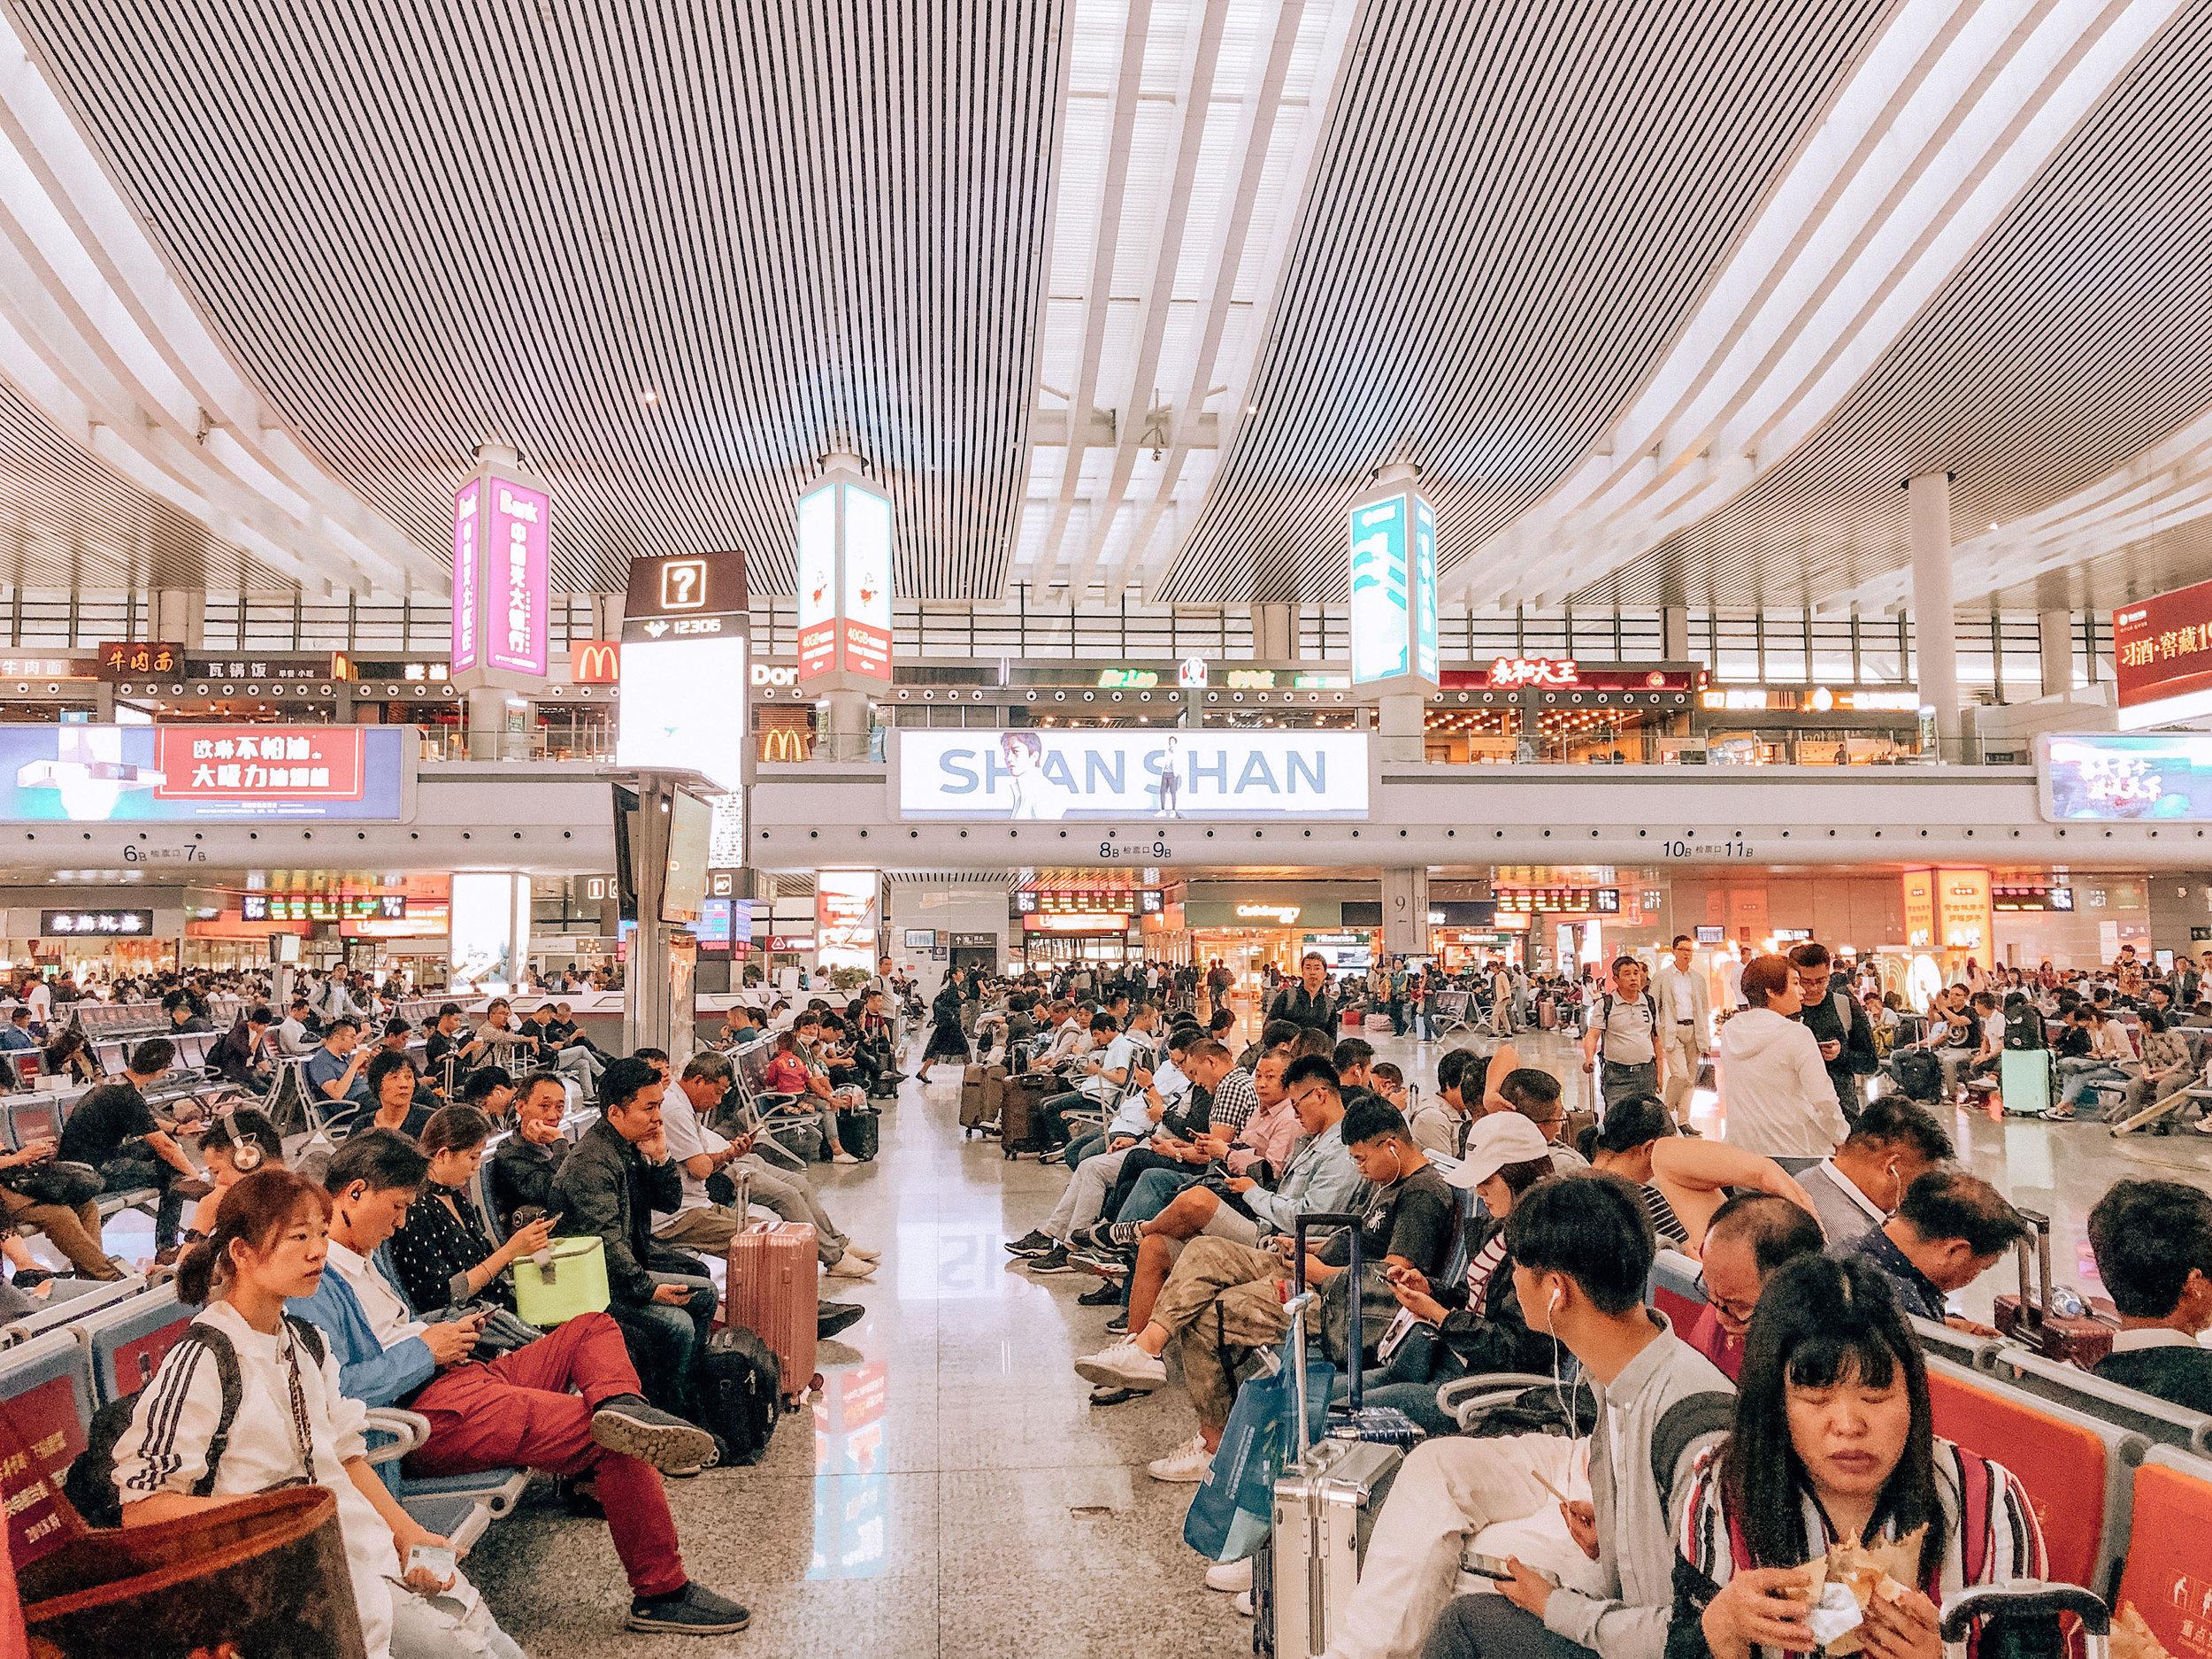 China_train_Station_3.jpg